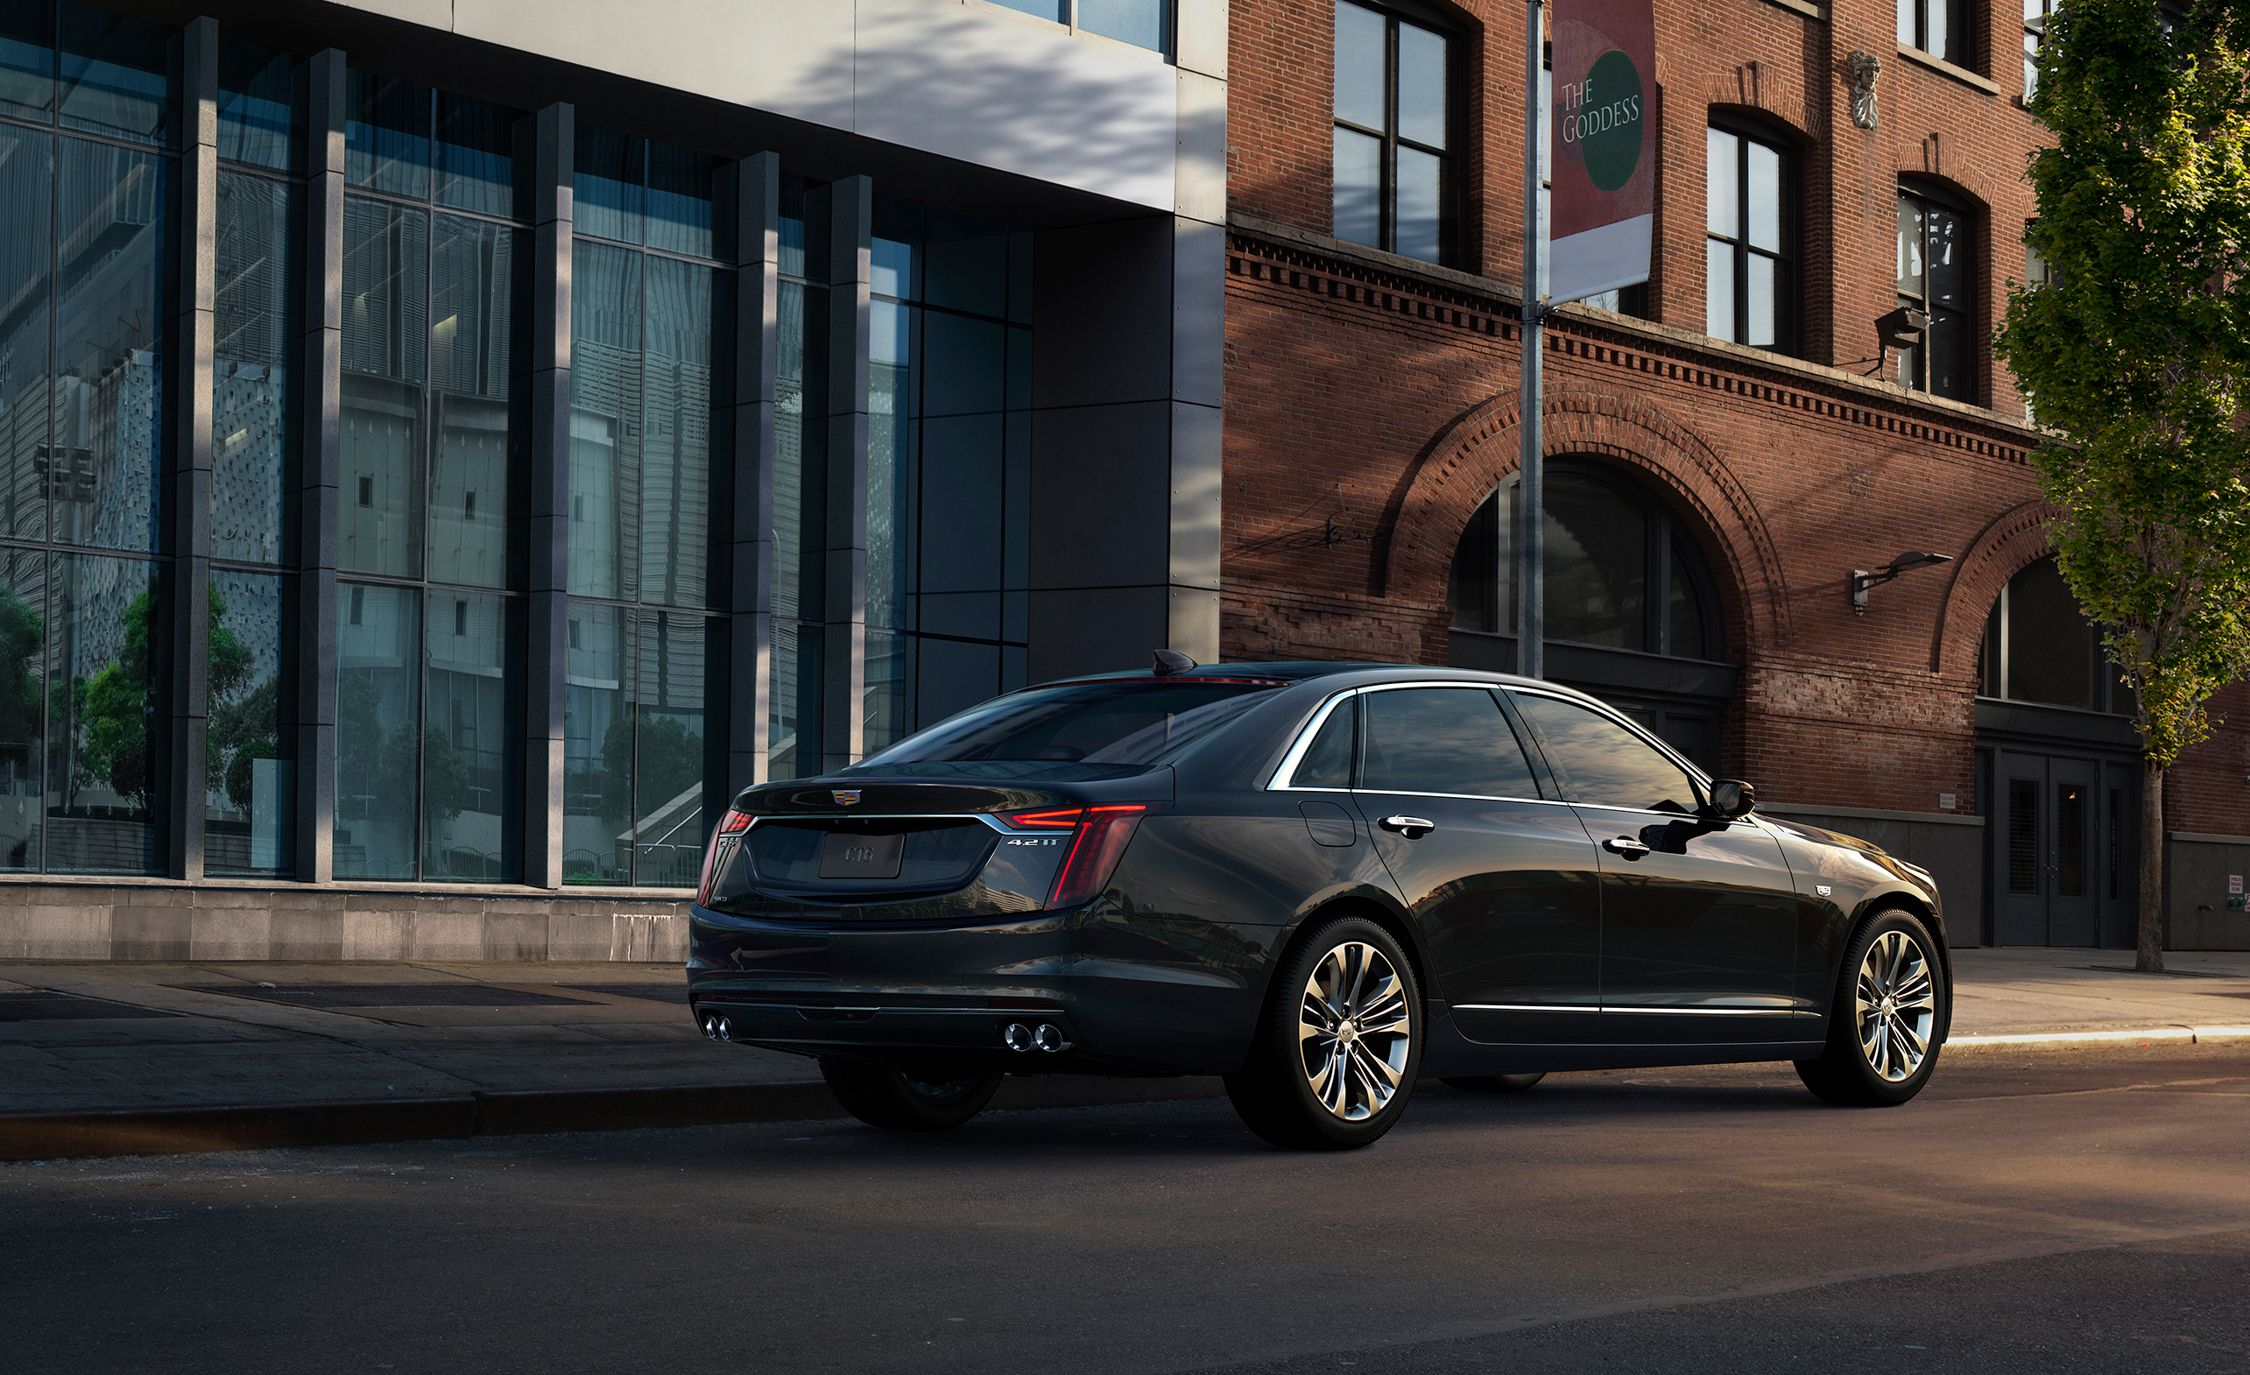 2019 Cadillac CT6 V-Sport Rear Three-Quarter Wallpapers (3)